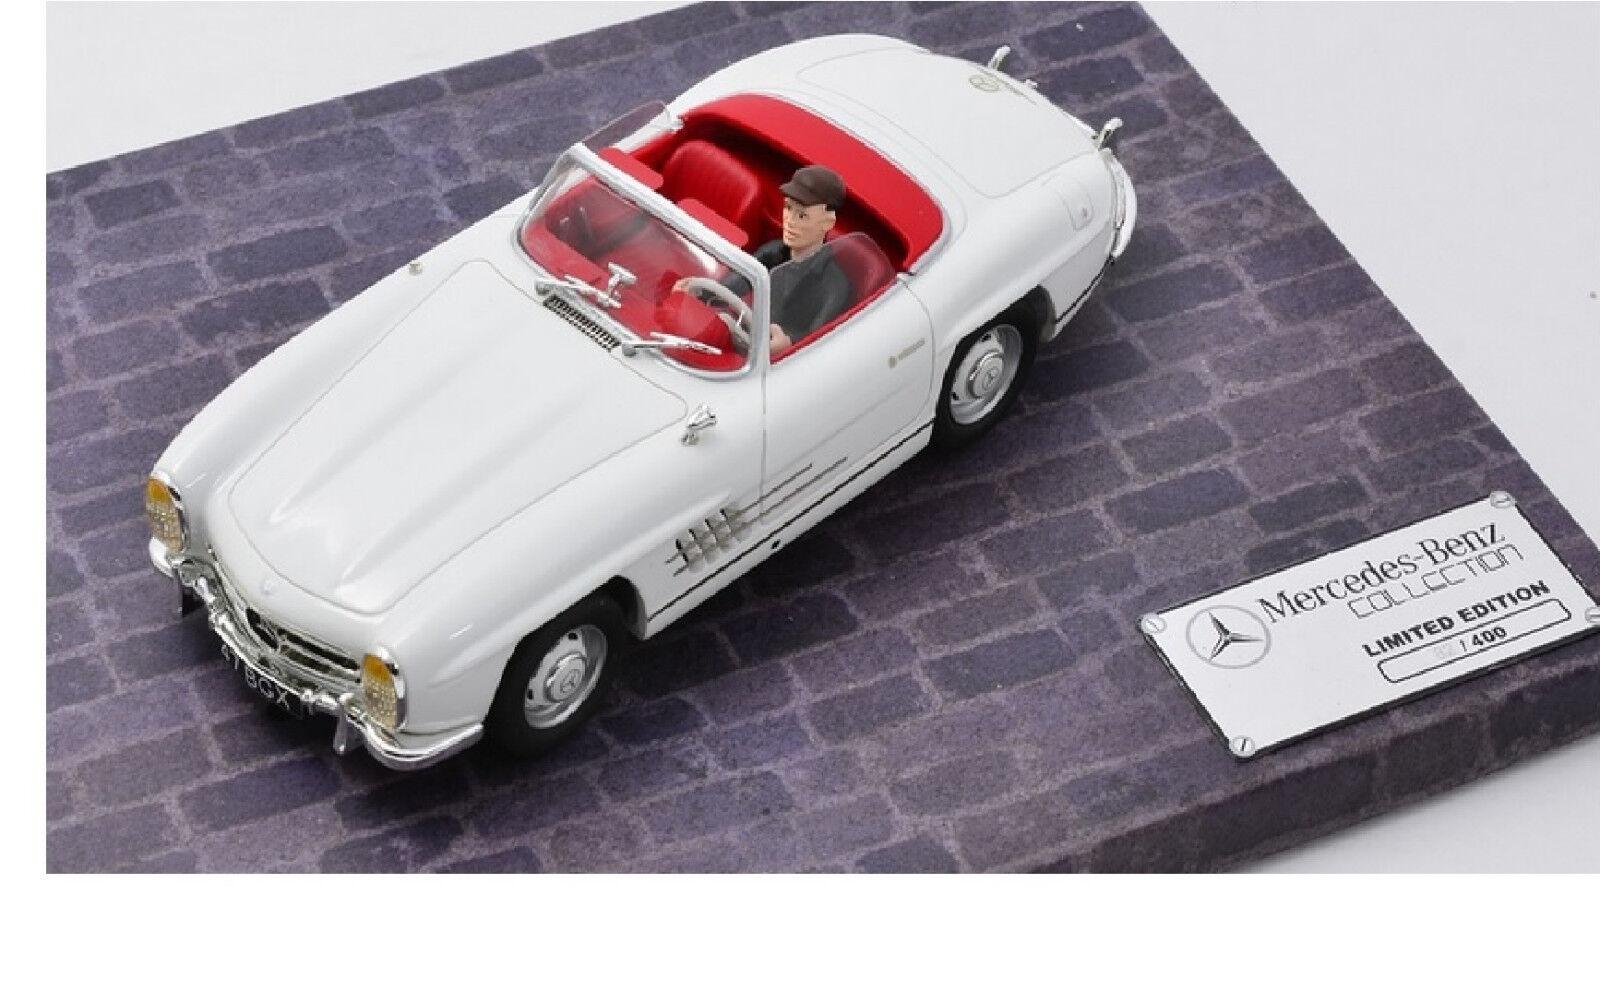 Top Slot Top-7112 Mercedes Benz 300sl Roadster Roadster Roadster 1958 Lted. Ed 400 Units MB bdf0df